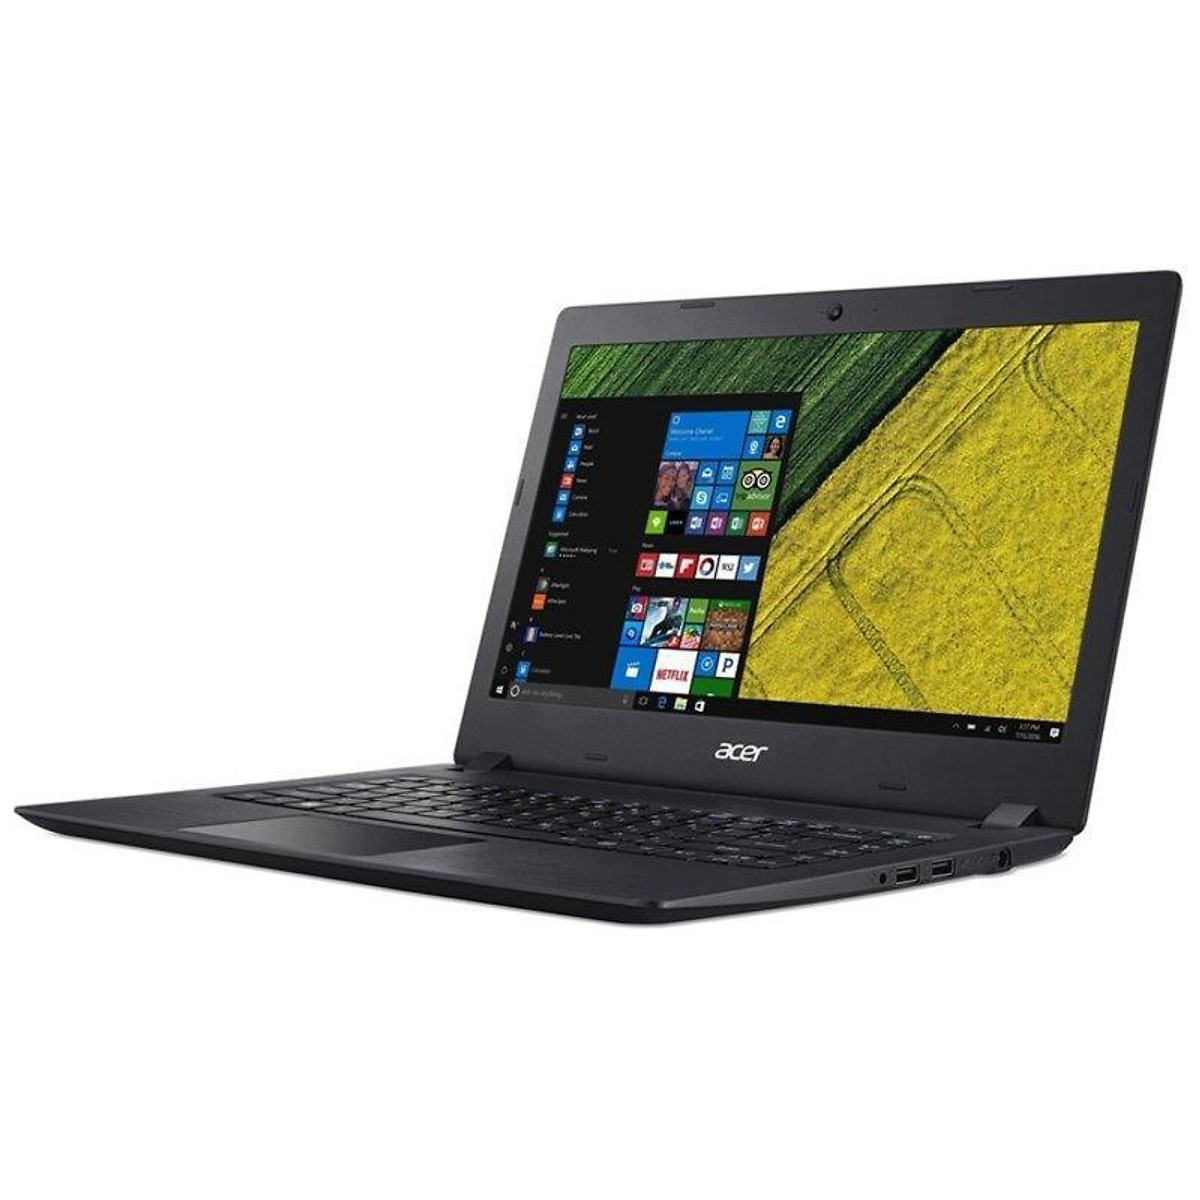 Laptop Acer A315-51-325E I3 7020